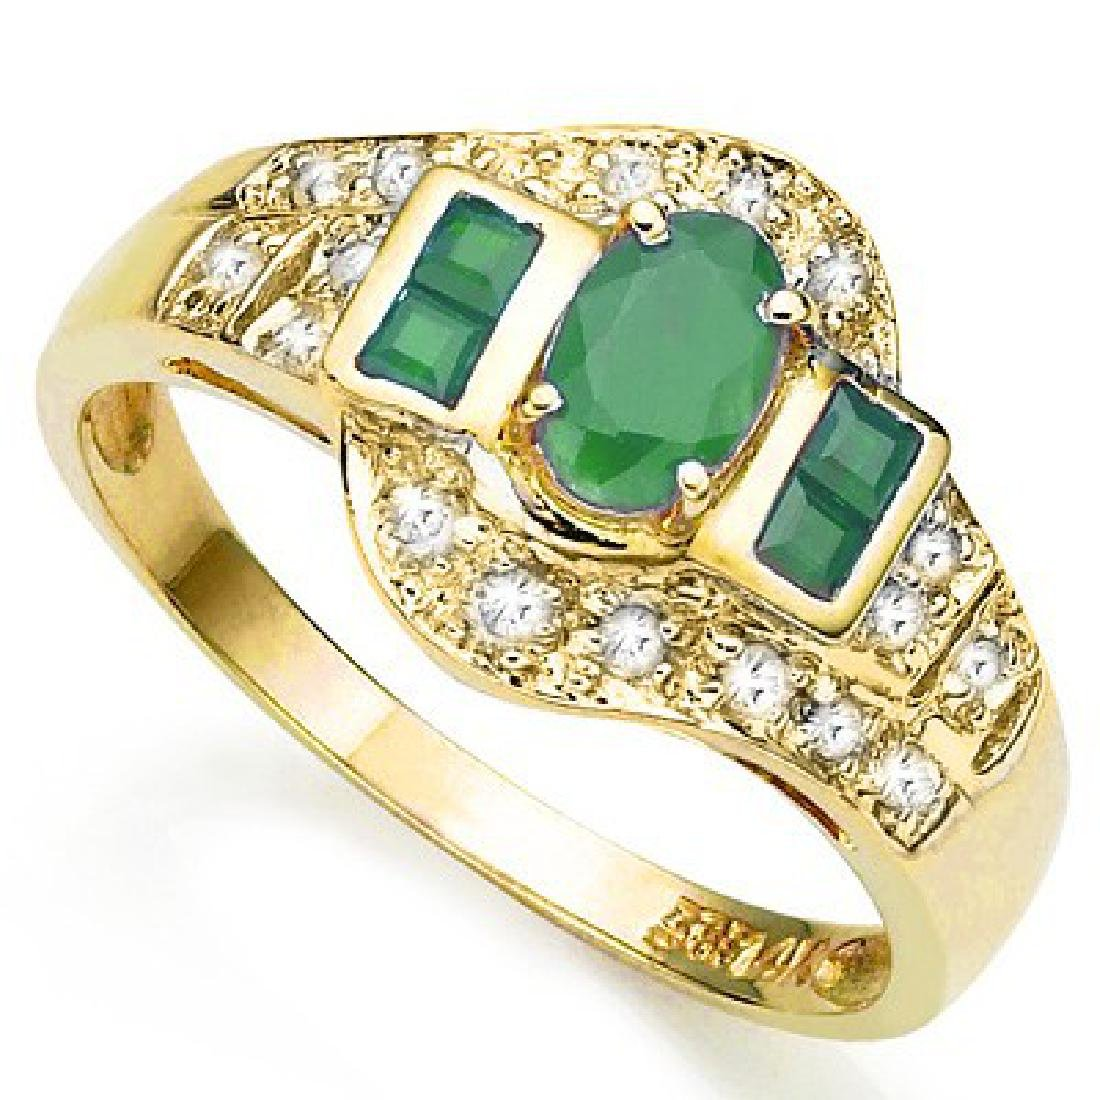 STUNNING 10K GOLD GENUINE EMERALD/DIAMOND RING